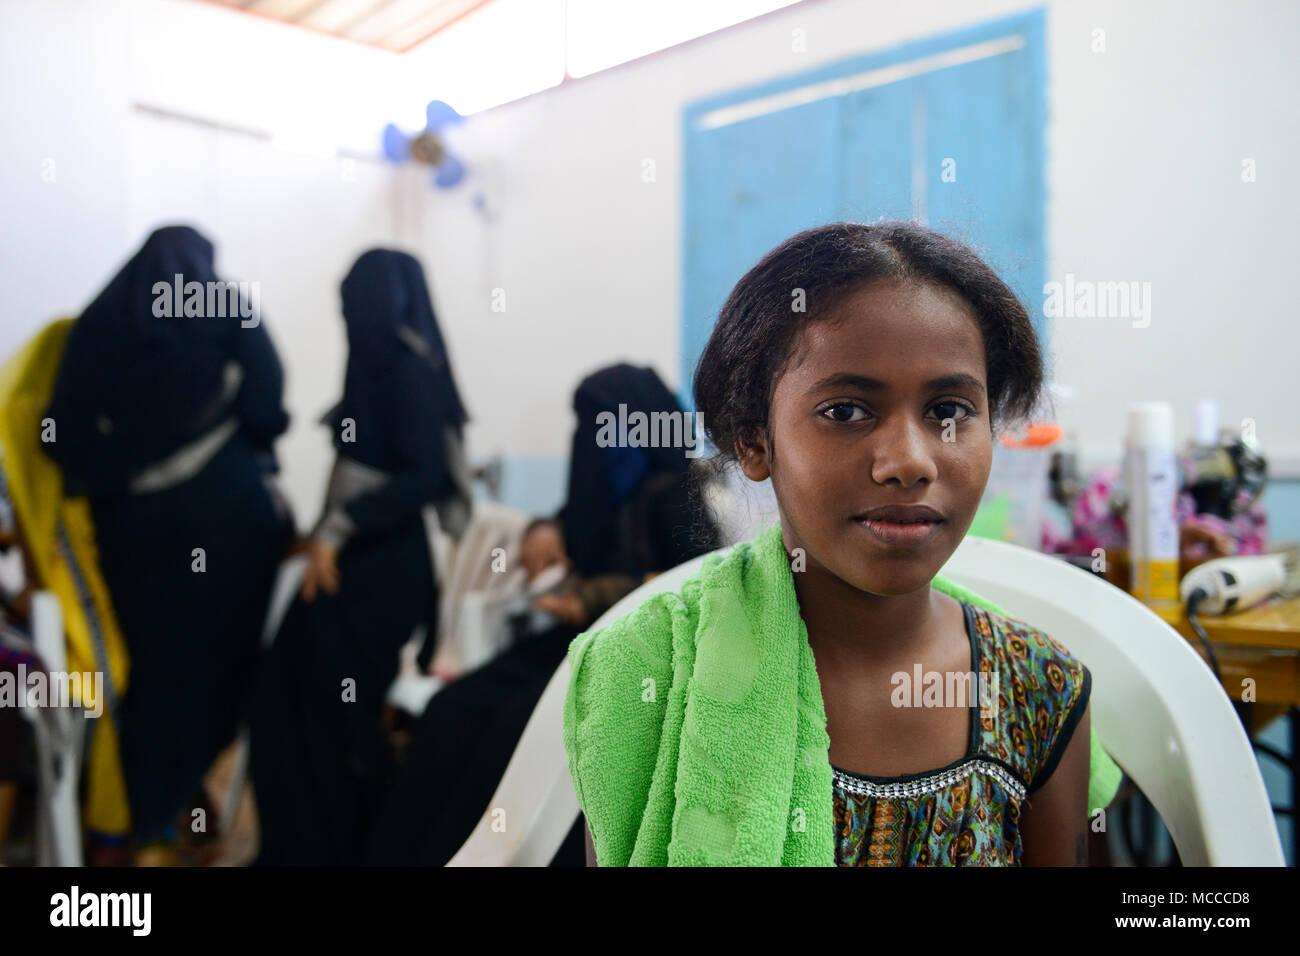 DJIBOUTI , Obock, refugee camp Markazi for yemeni war refugees, NGO hairdressing traing class for women and girls / DSCHIBUTI, Obock, Fluechtlingslager Markazi fuer jemenitische Fluechtlinge, Naeh-, Friseur-und Kosmetik Klasse einer NGO - Stock Image